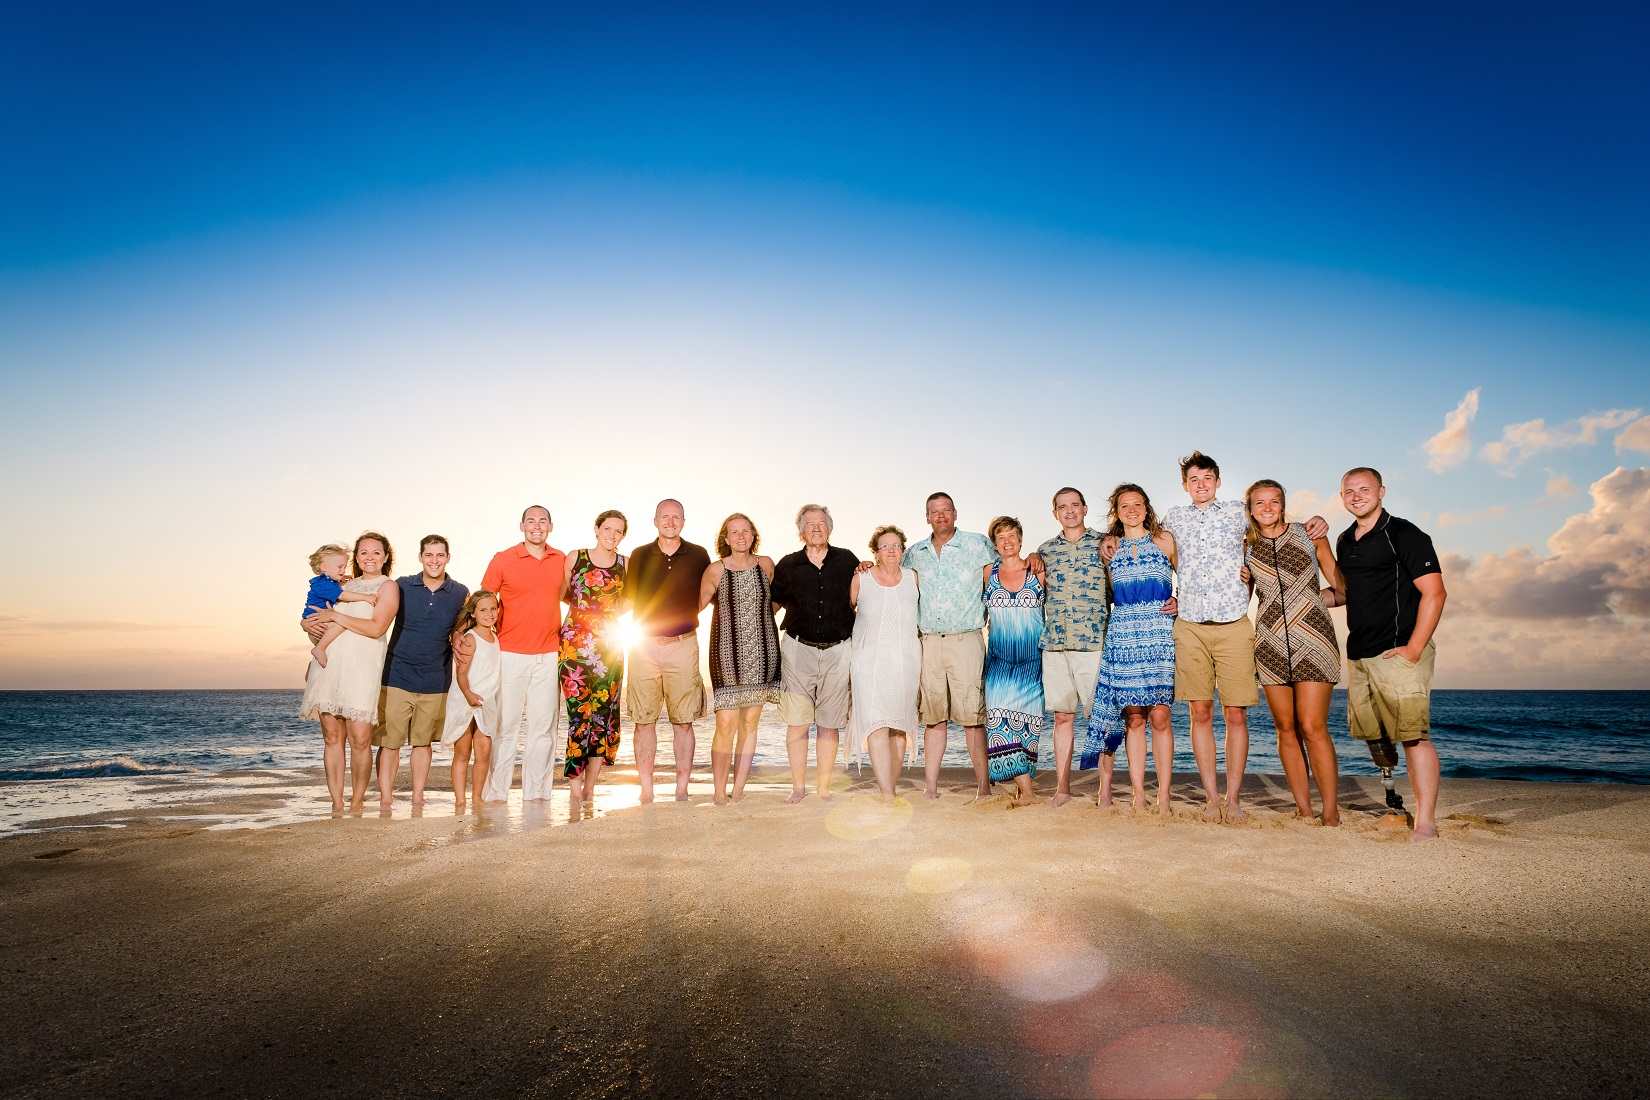 oahu family beach sunset photo portrait north shore photographer